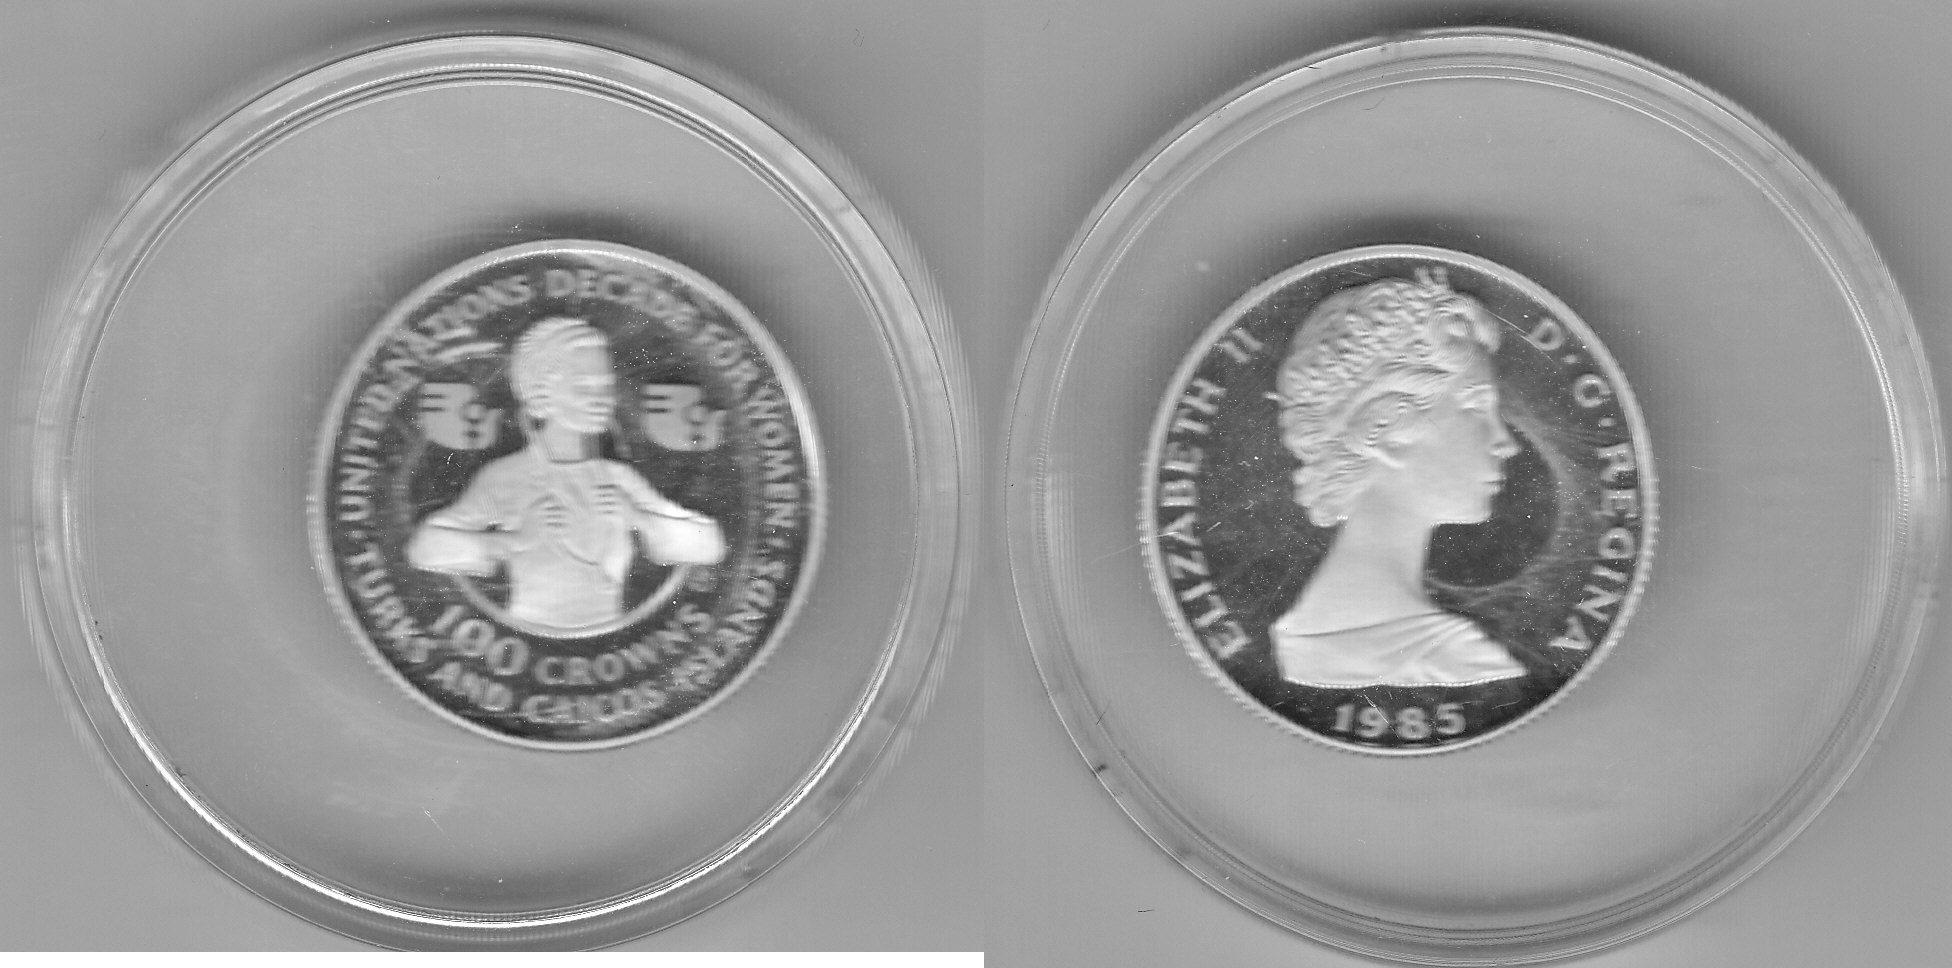 Turks and Caicoos 100 Crowns 1985 Dekade der Frau